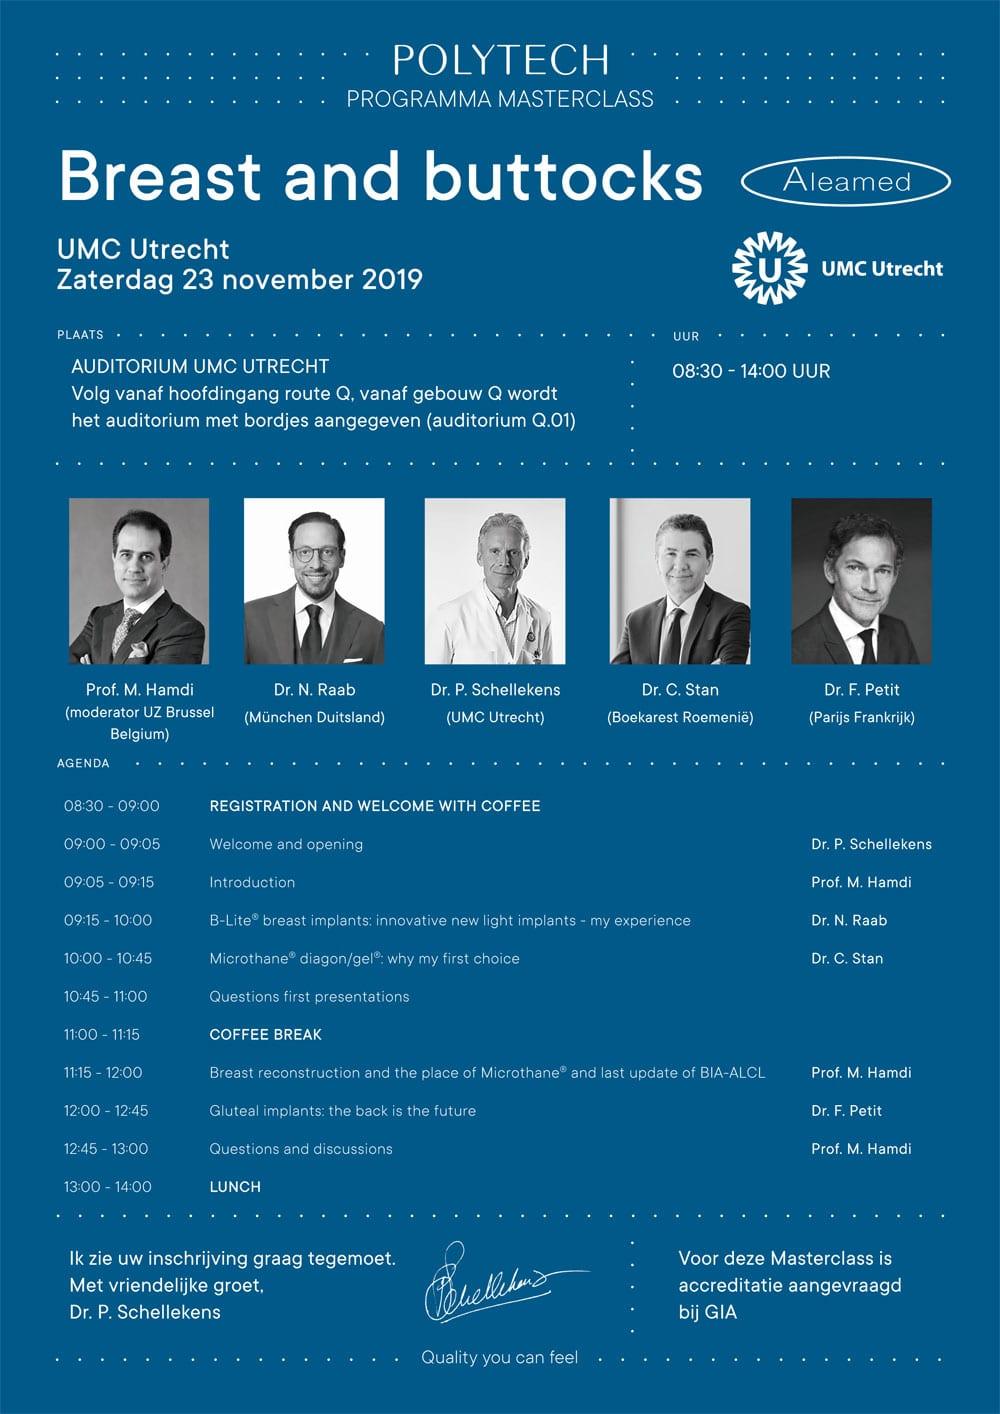 Polytech Masterclass am 23. November 2019 in Utrecht/Holland - Dr. Nikolaus Raab